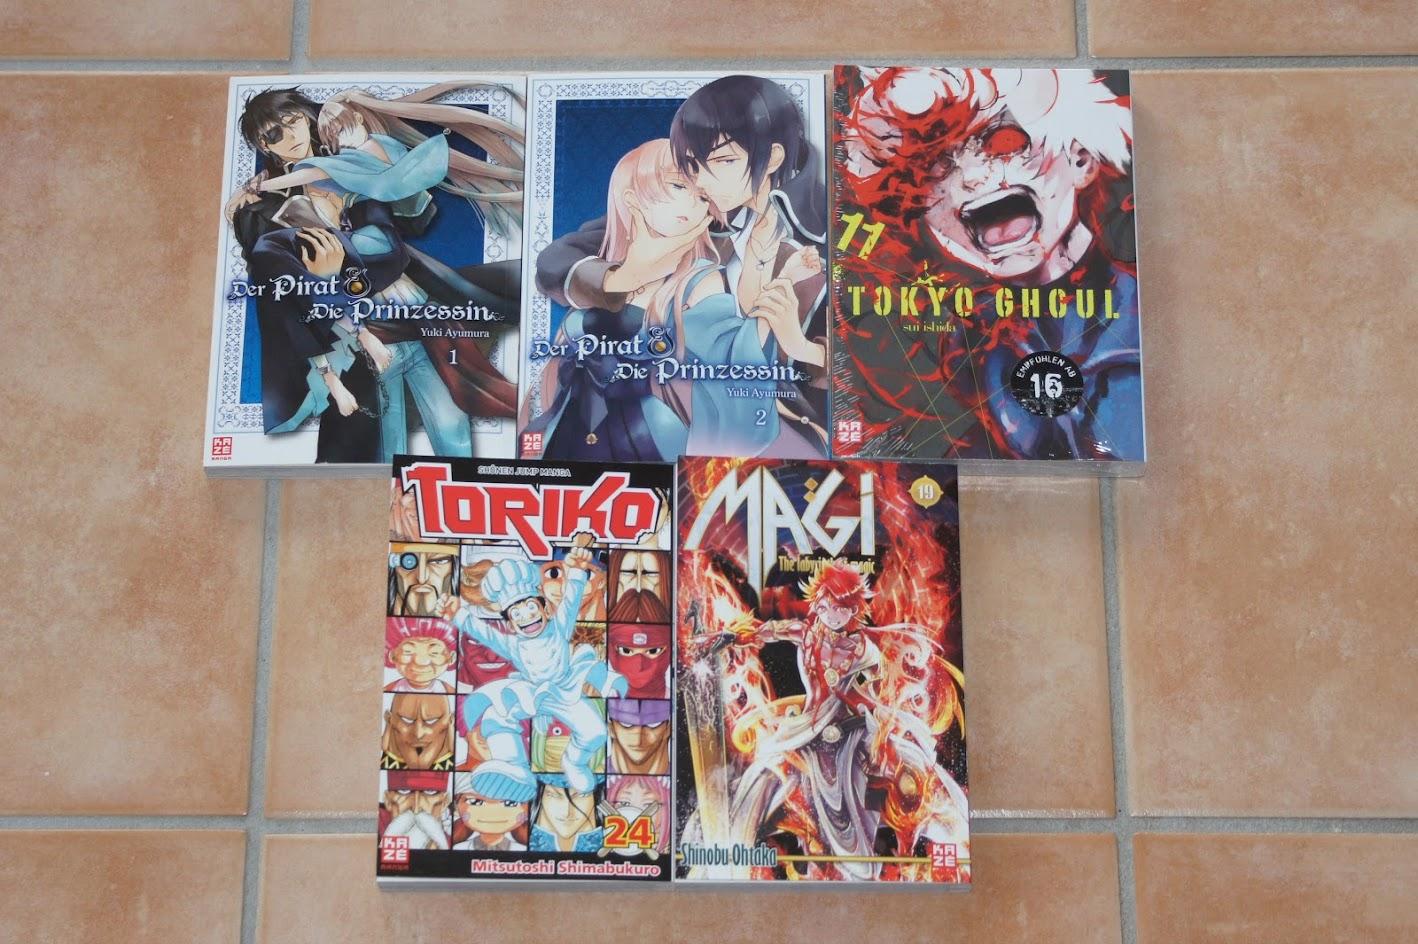 Kazé Manga Neuheiten Toriko Magi Tokyo Ghoul